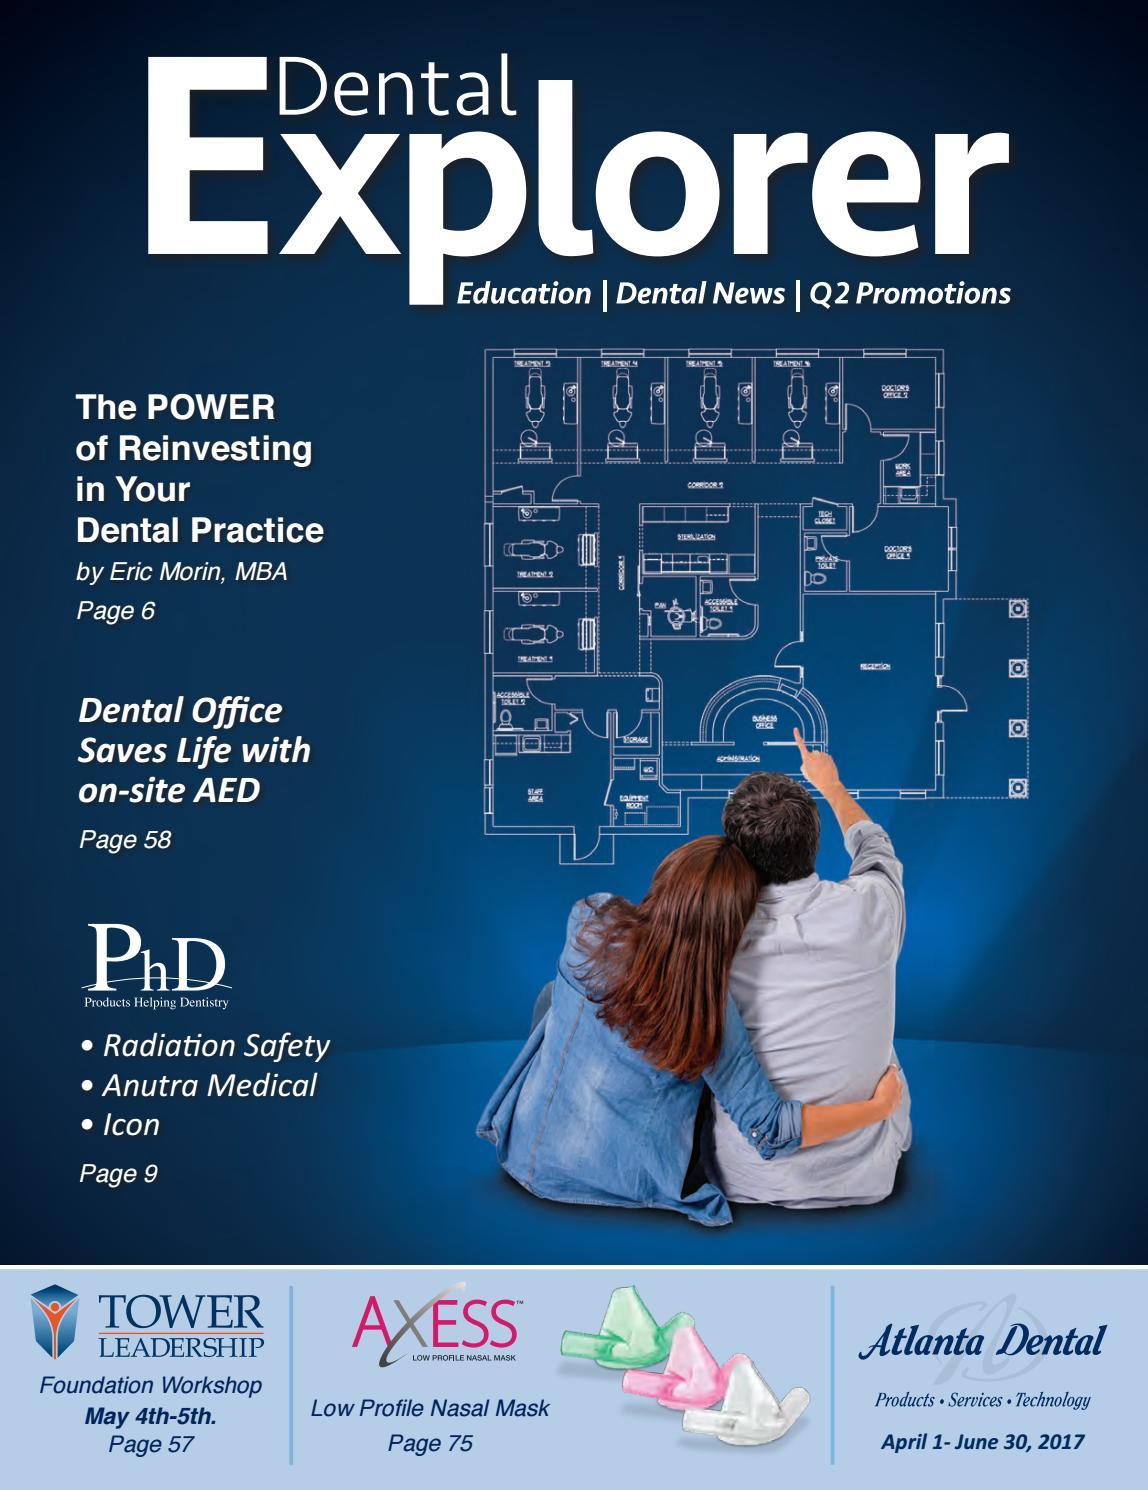 dental explorer q2 2017 by atlanta dental supply - issuu